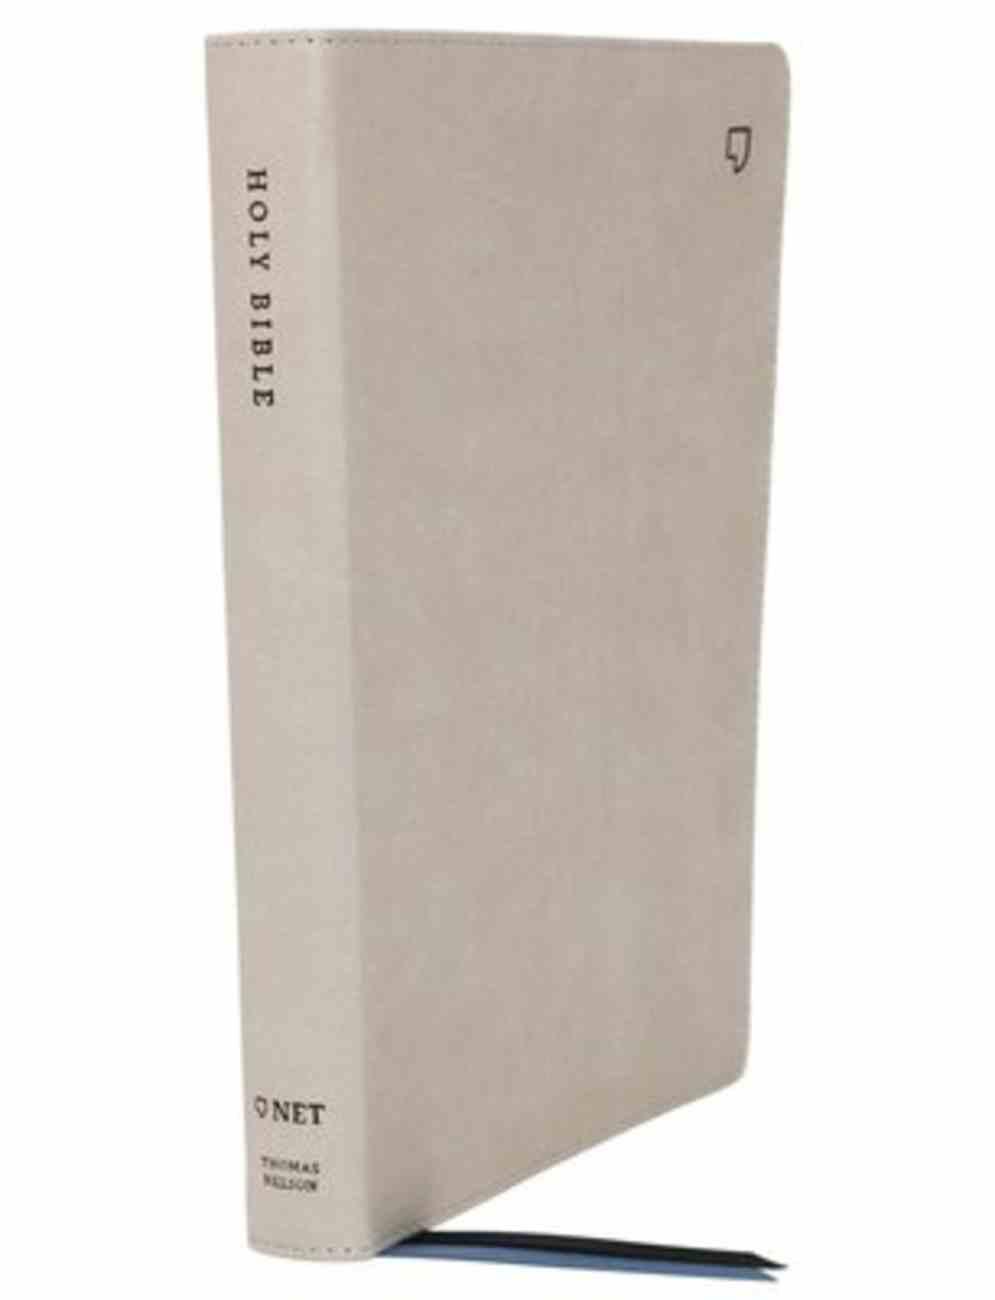 NET Bible Thinline Large Print Stone Indexed Premium Imitation Leather